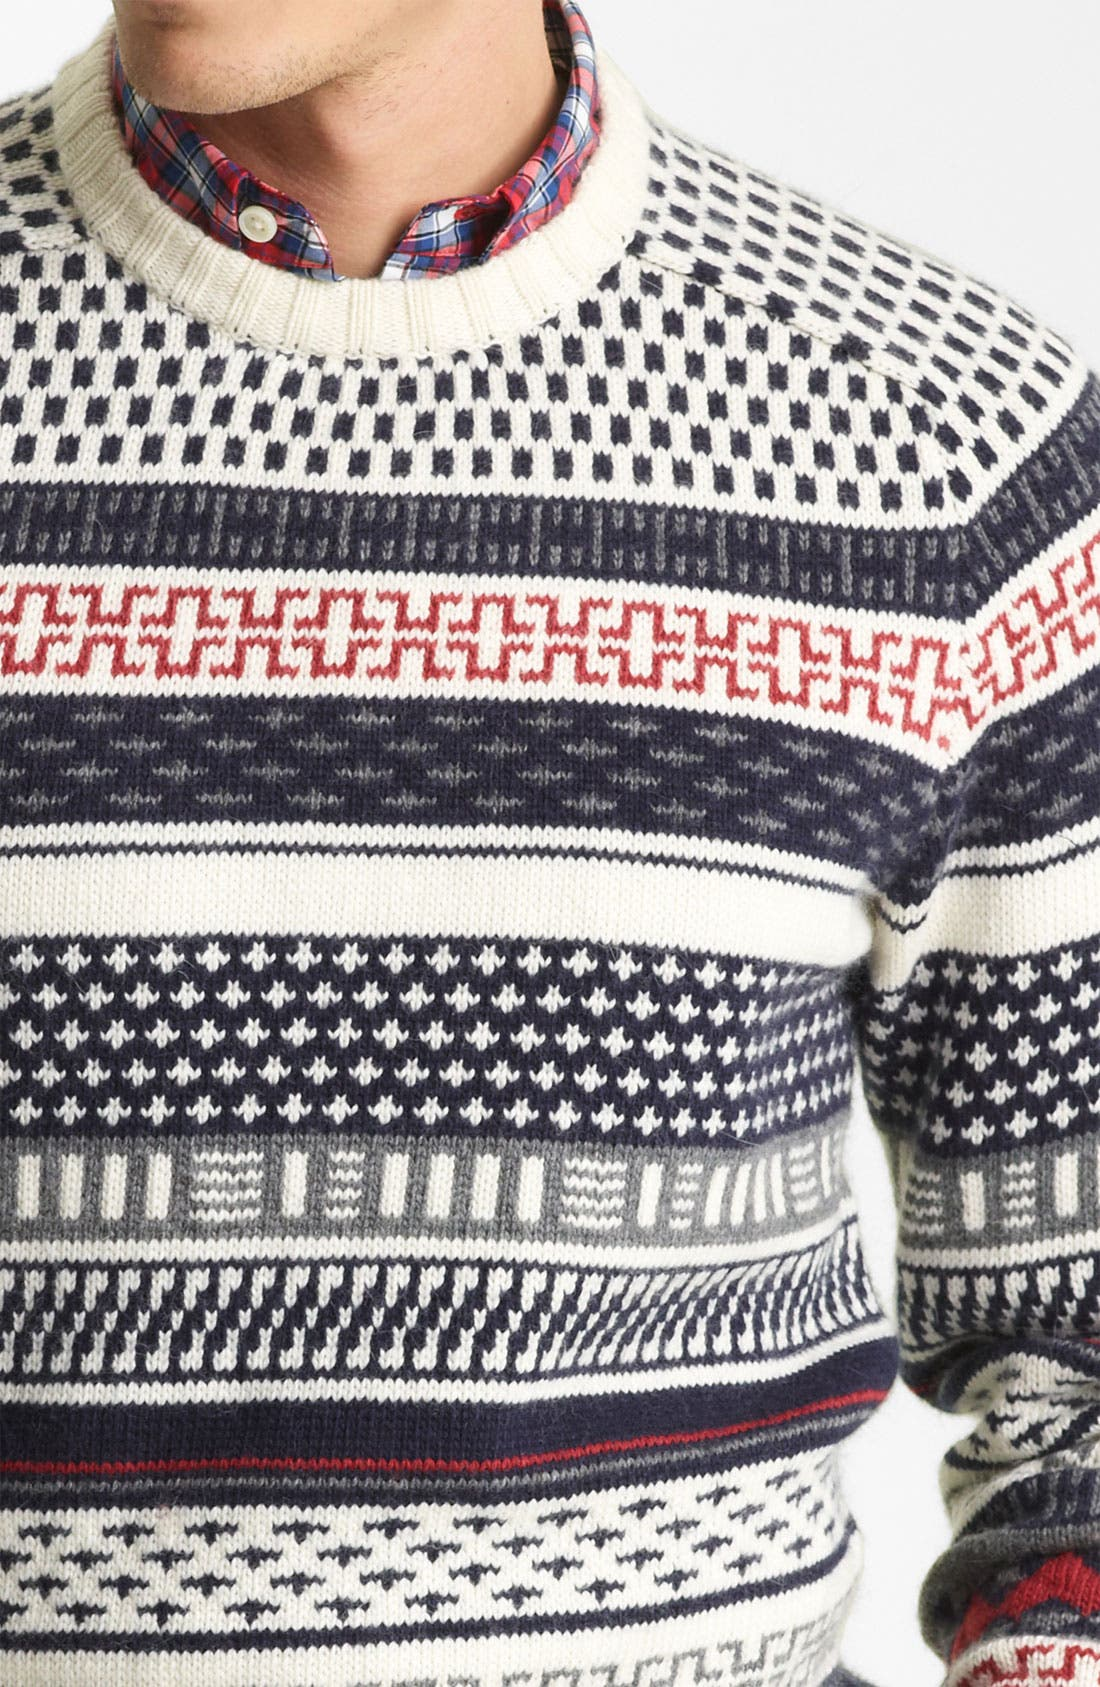 JACK SPADE,                             'Stone' Fair Isle Crewneck Sweater,                             Alternate thumbnail 3, color,                             142